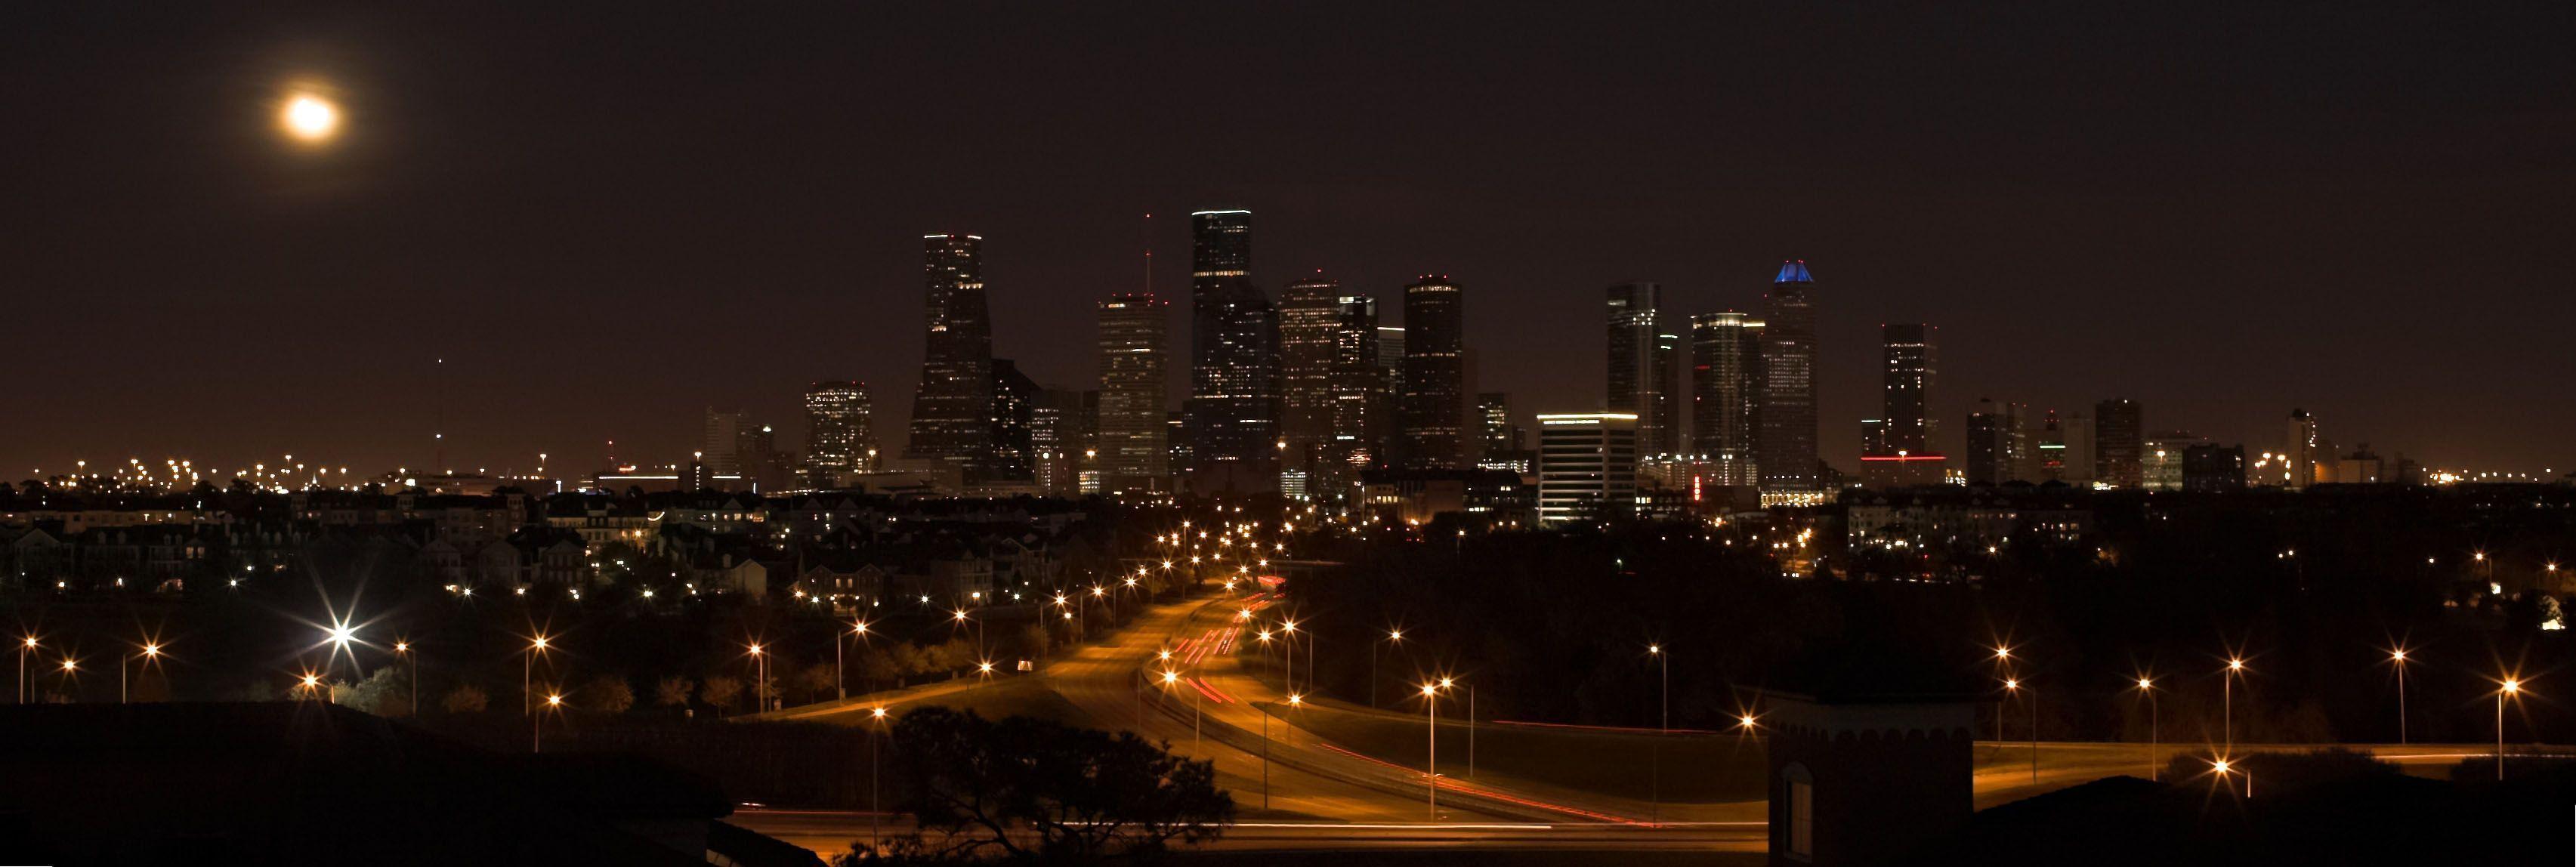 2480 X 520 Pixels Related Keywords: Houston Skyline Wallpapers